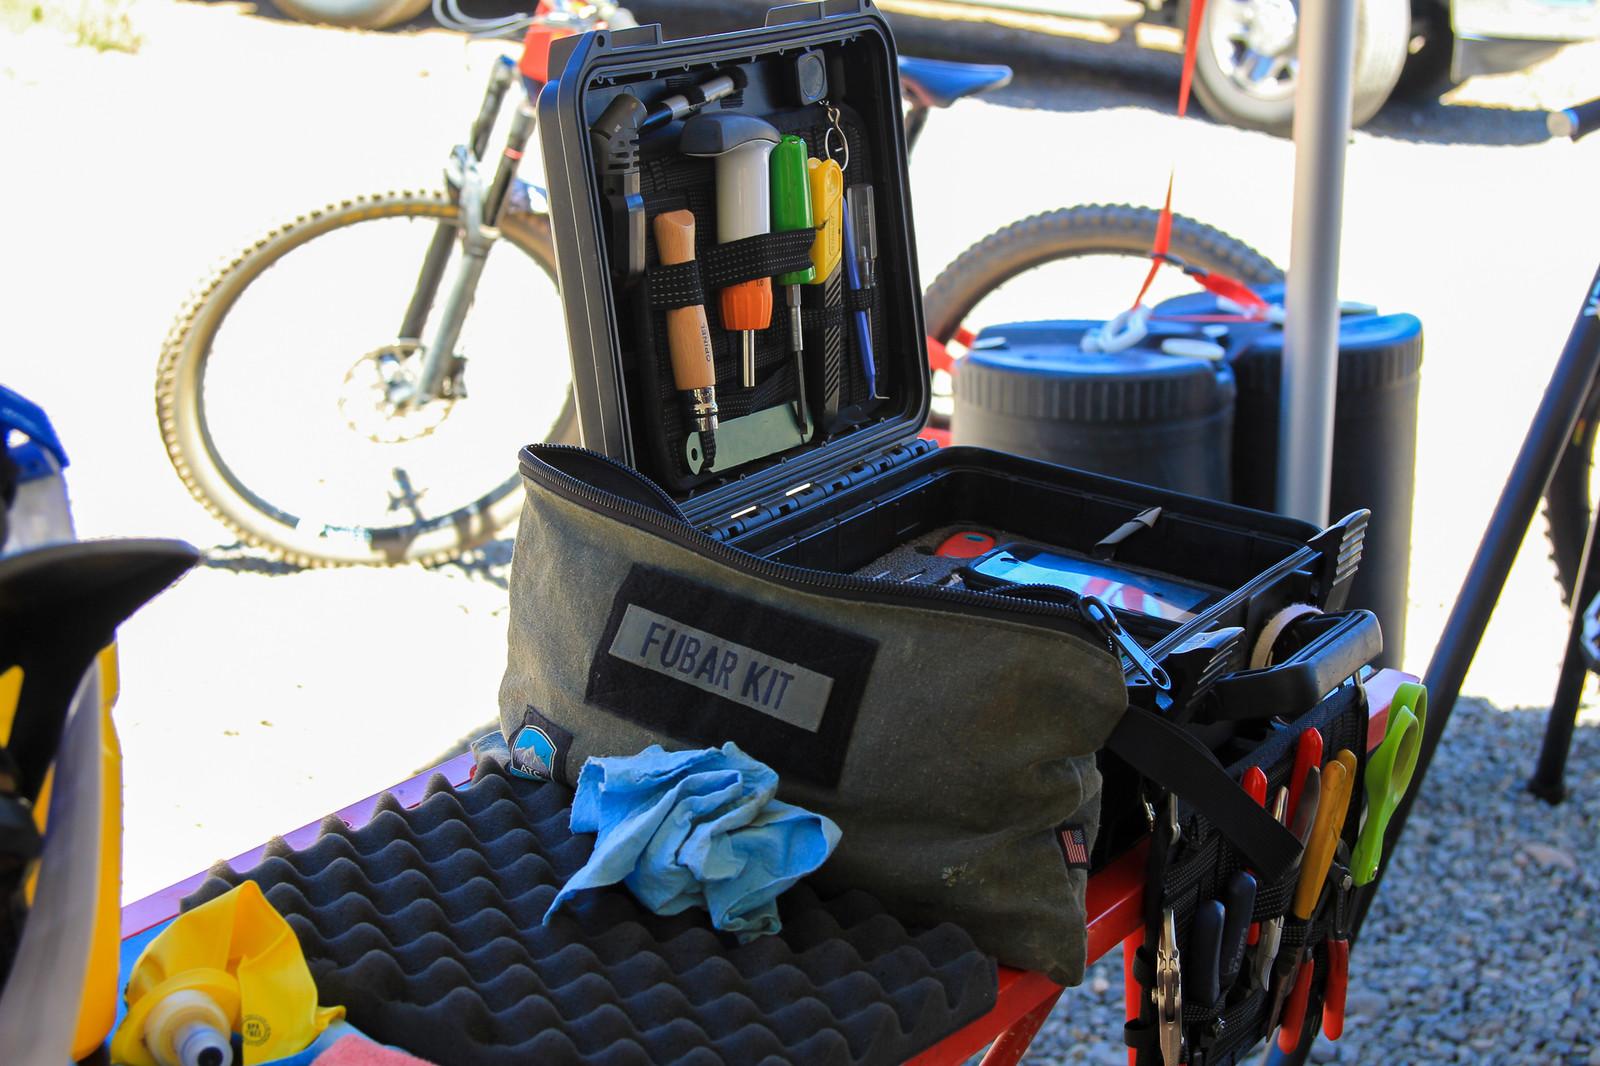 Fubar Proof - Pit Bits 2019 Enduro World Series - Northstar - Mountain Biking Pictures - Vital MTB